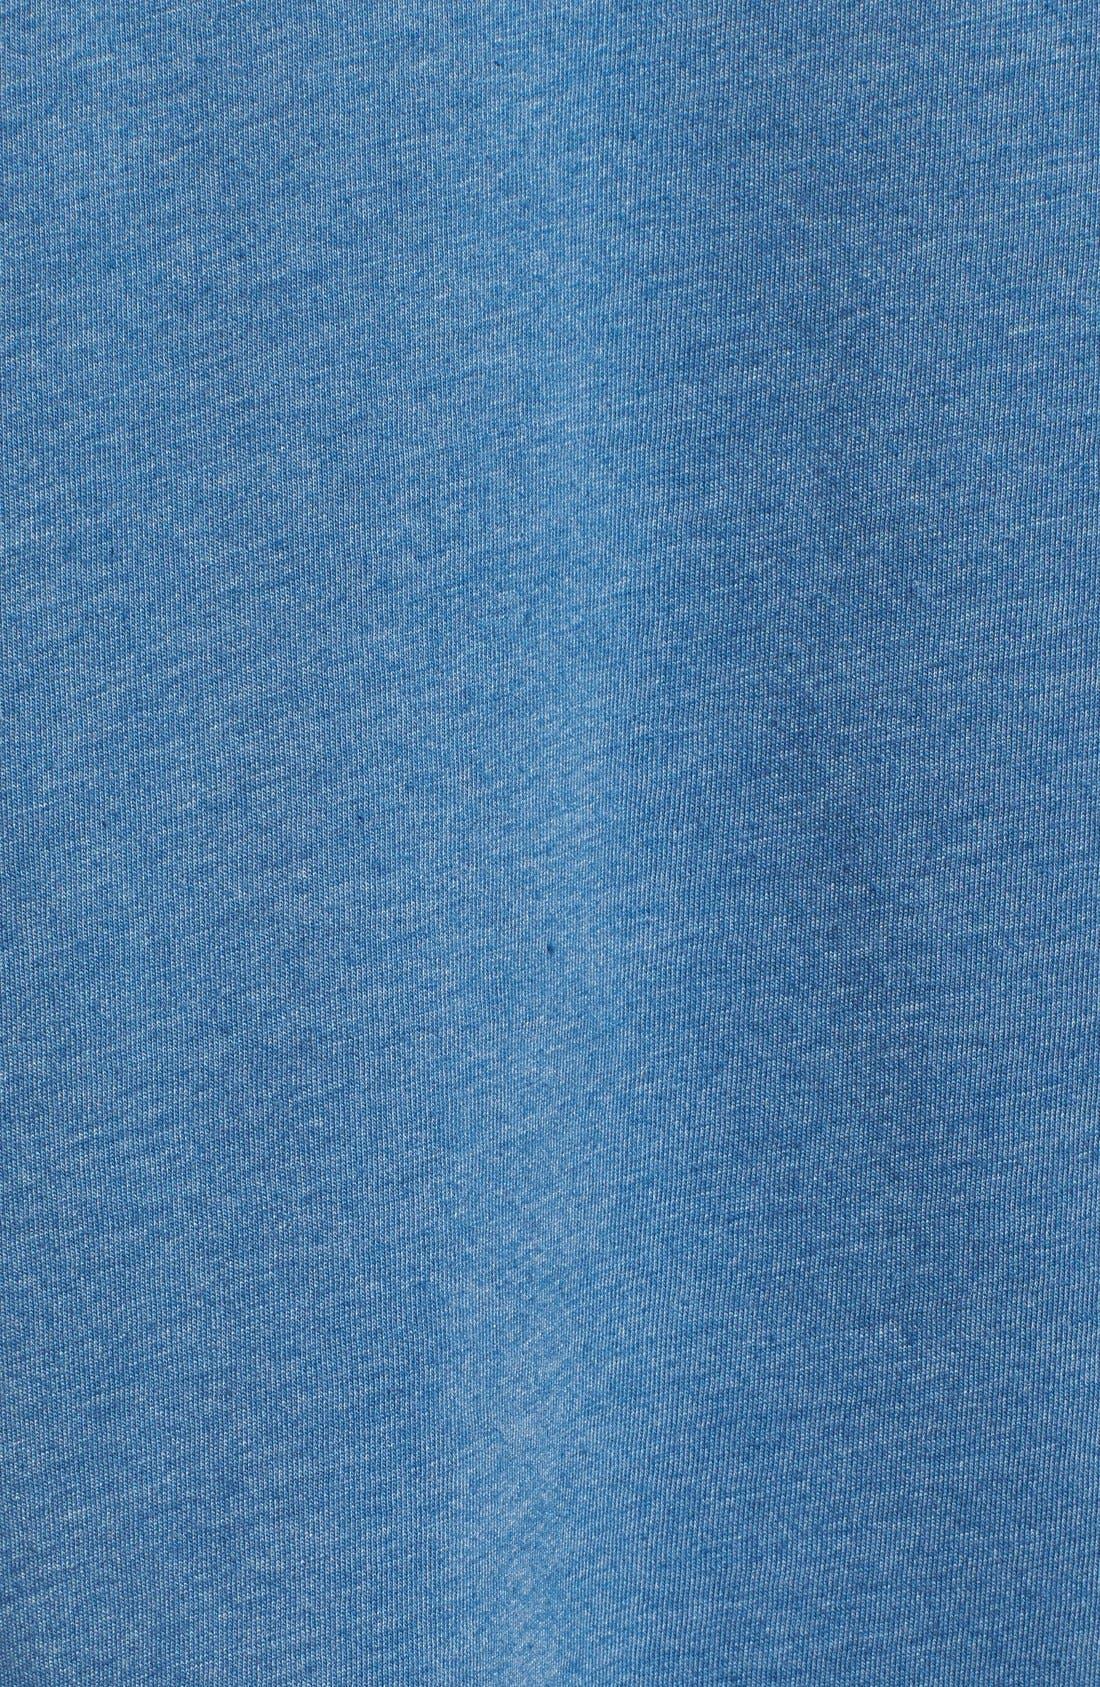 Alternate Image 3  - Retro Brand 'Steiner's Bar Room' Slim Fit Graphic T-Shirt